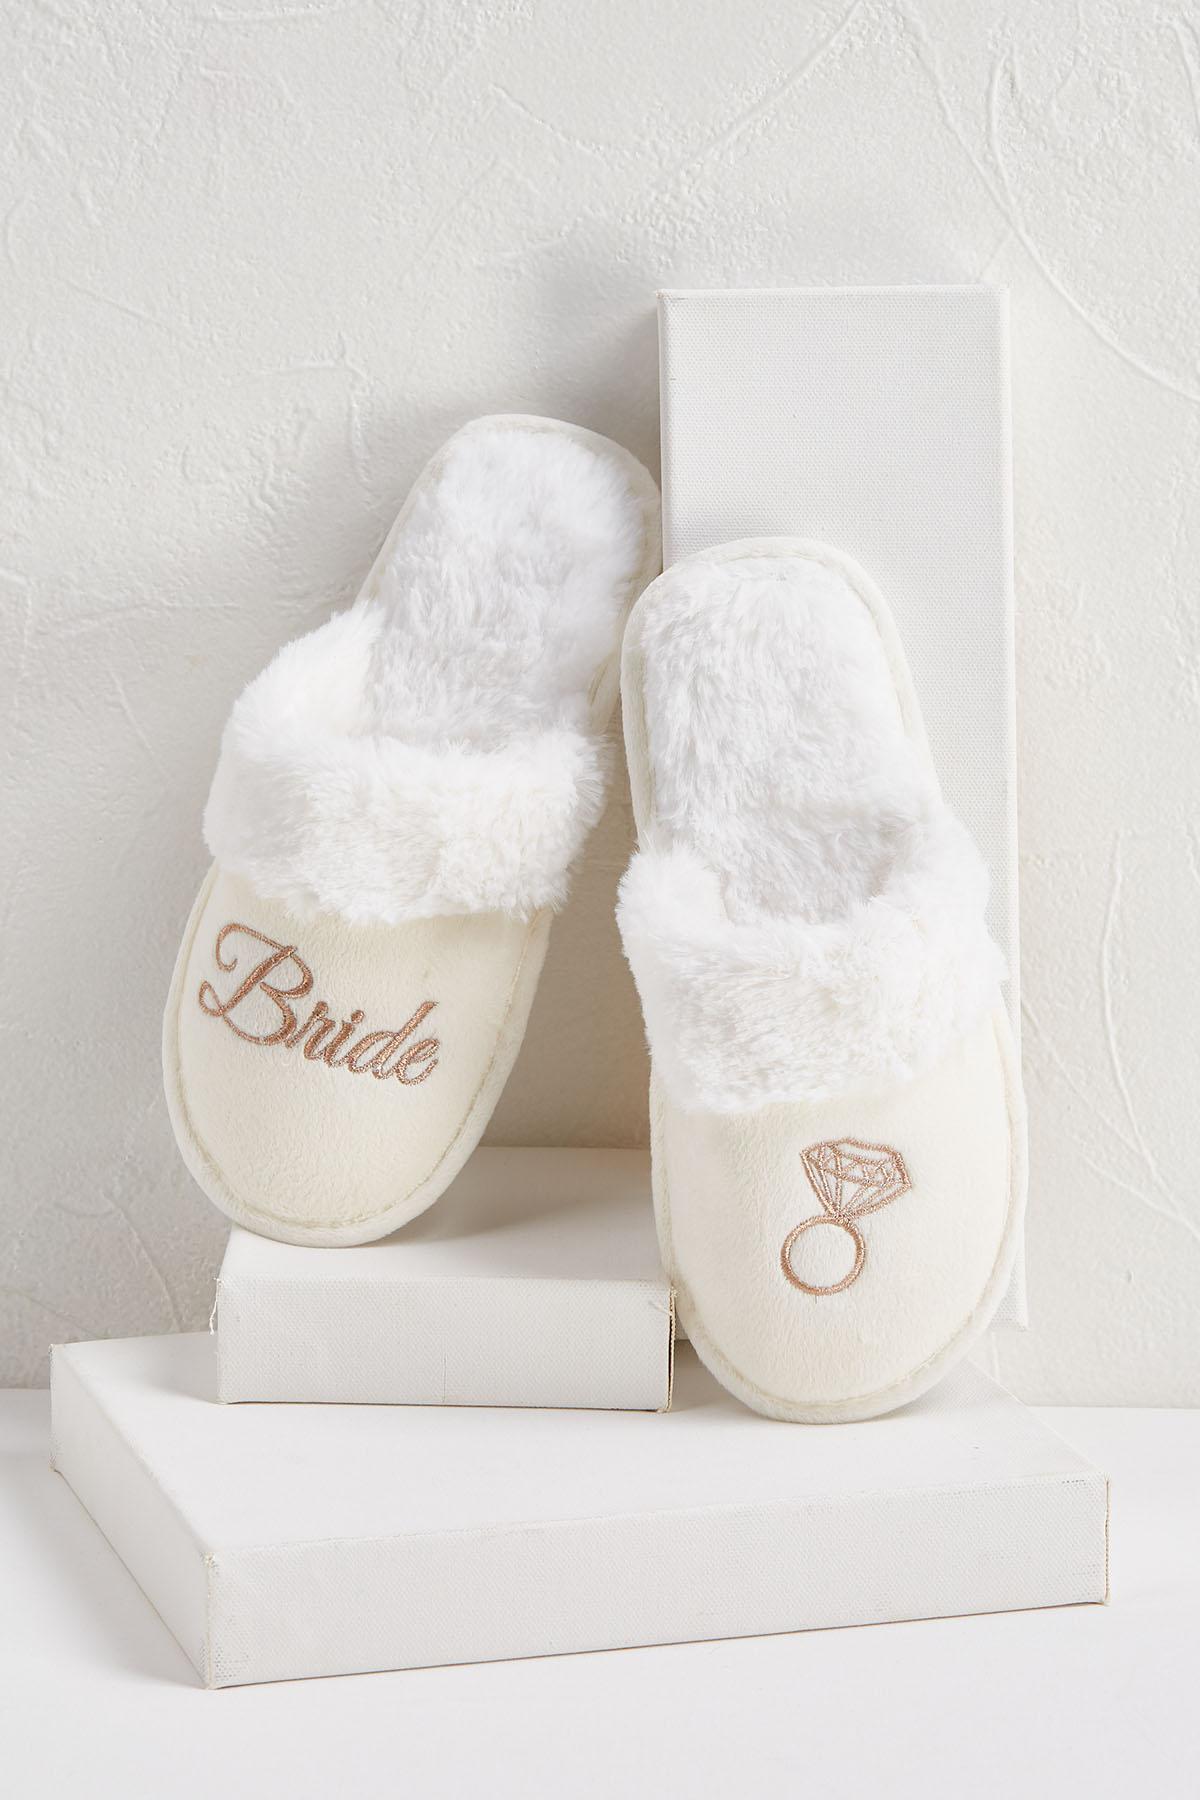 Cozy Bride Slippers